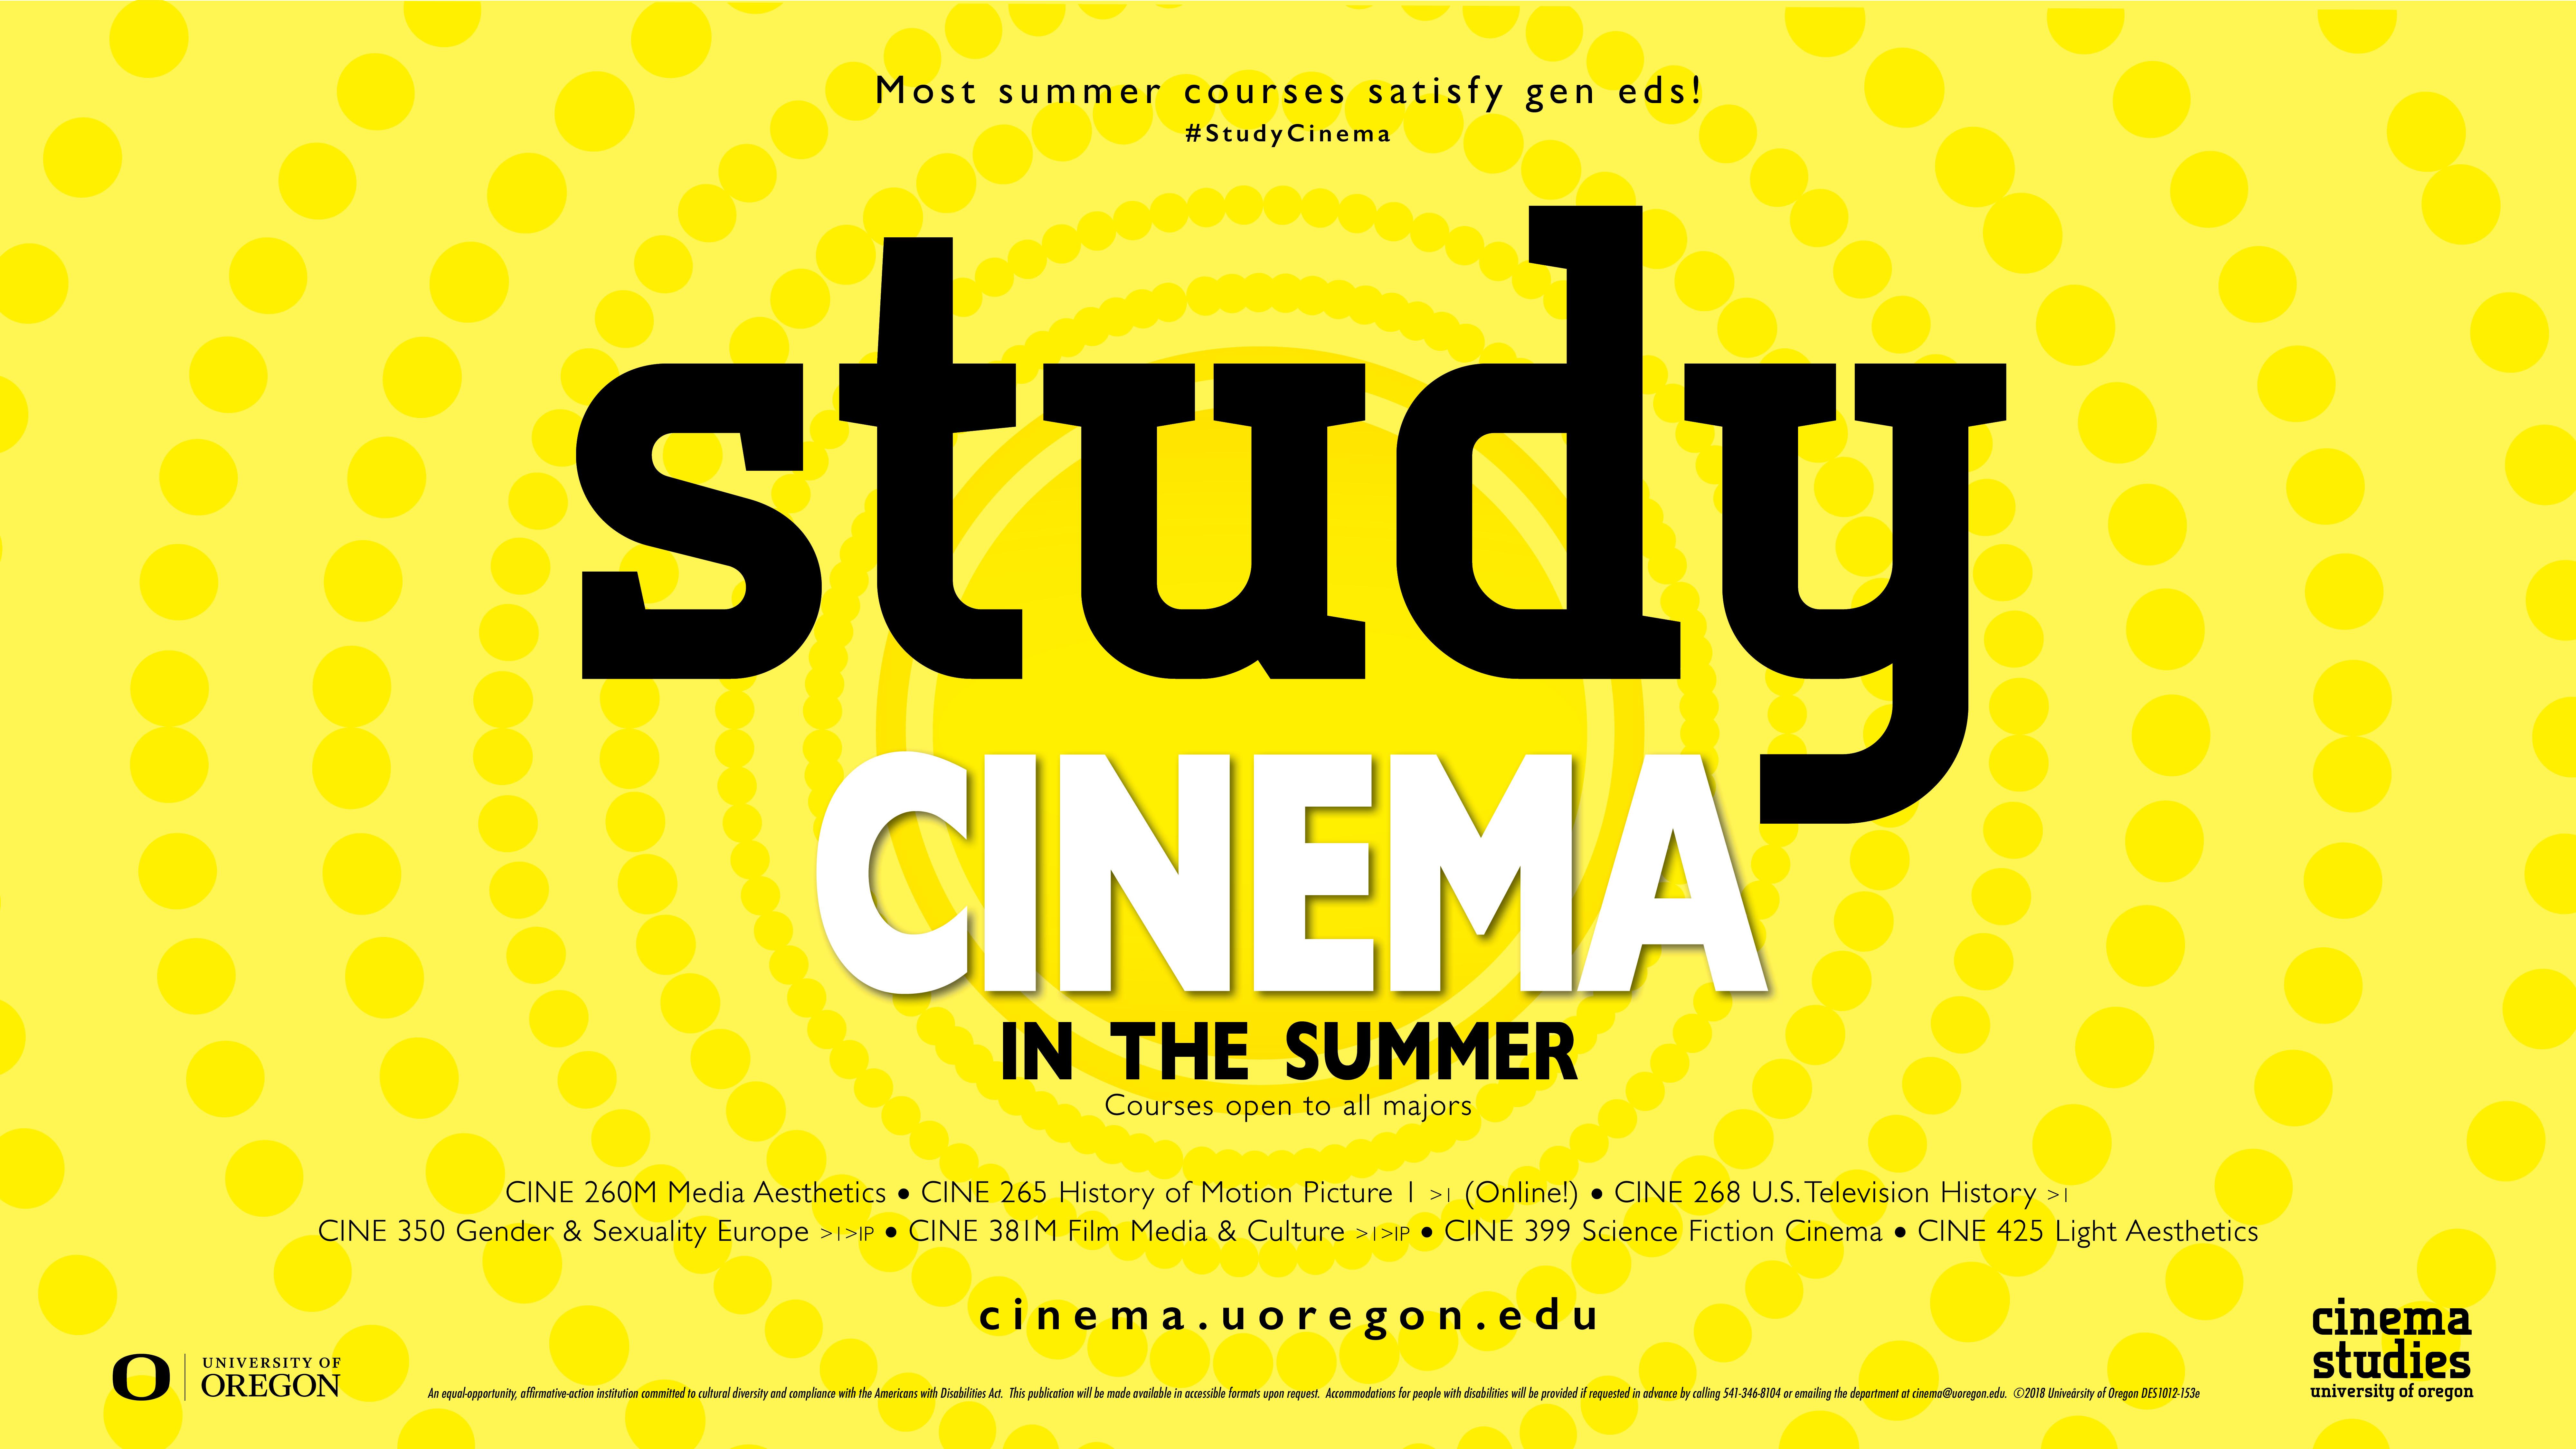 Cinema Studies Summer 2018 Course Poster